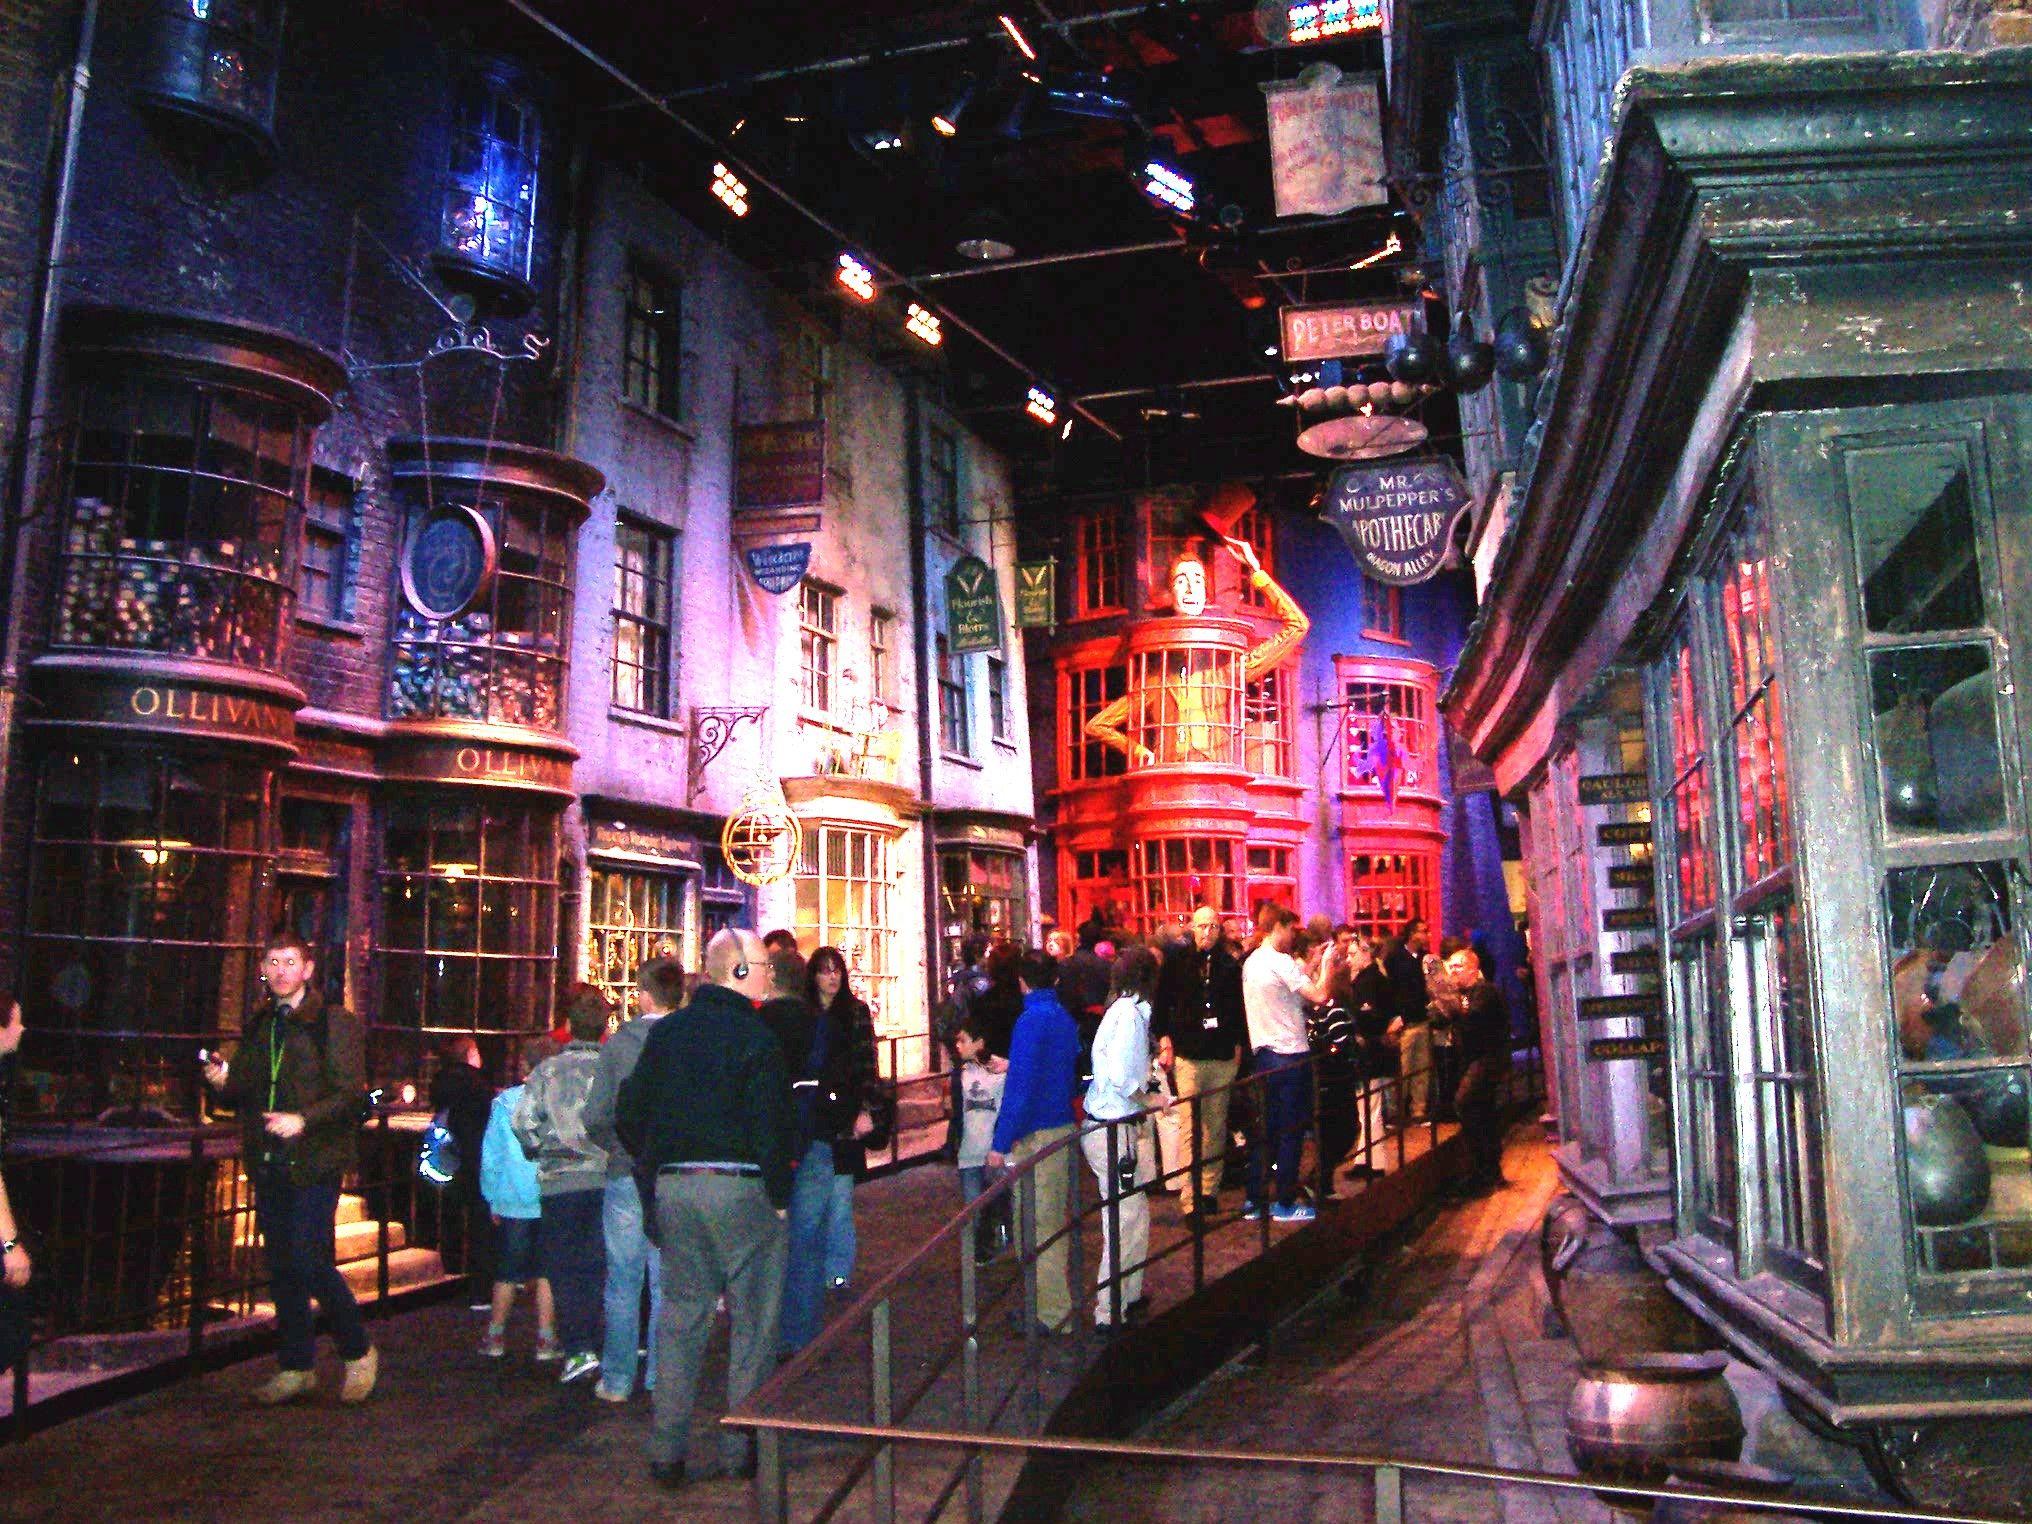 Warner Bros Harry Potter Studio Tour Watford Uk Harry Potter Studio Tour Harry Potter Studios Studio Tour